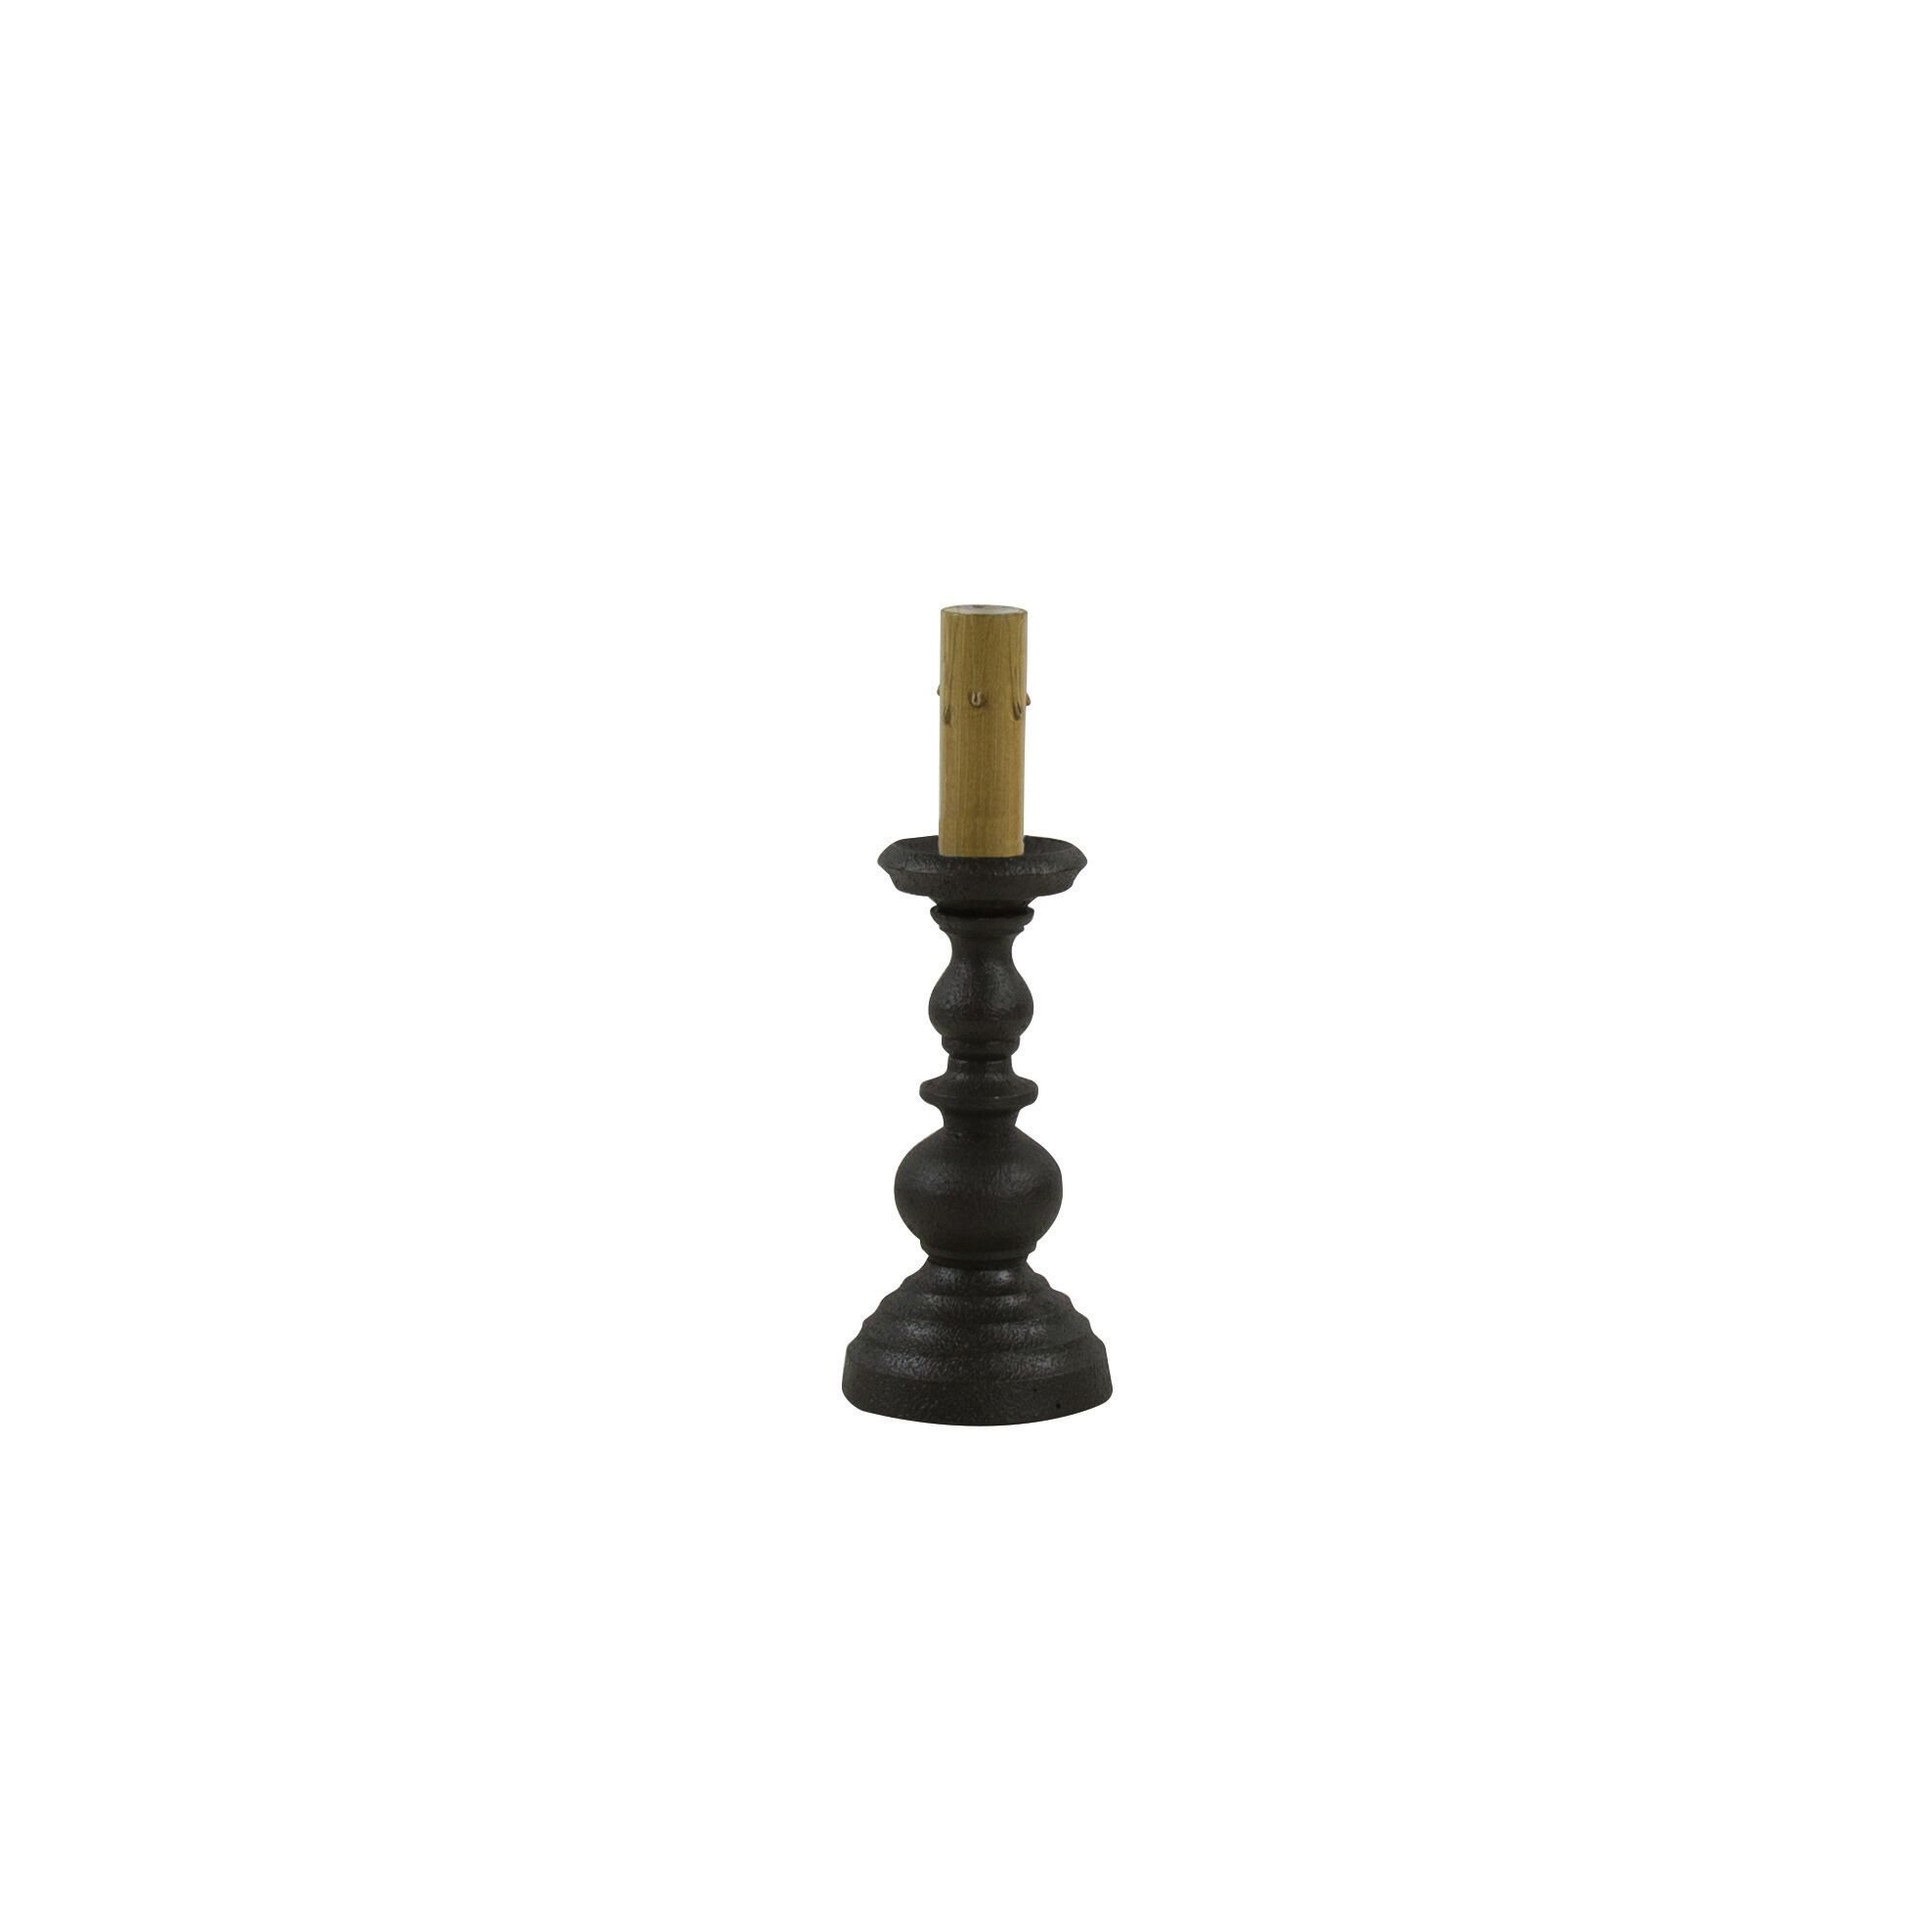 Park Designs Small Black Candlestick Lamp